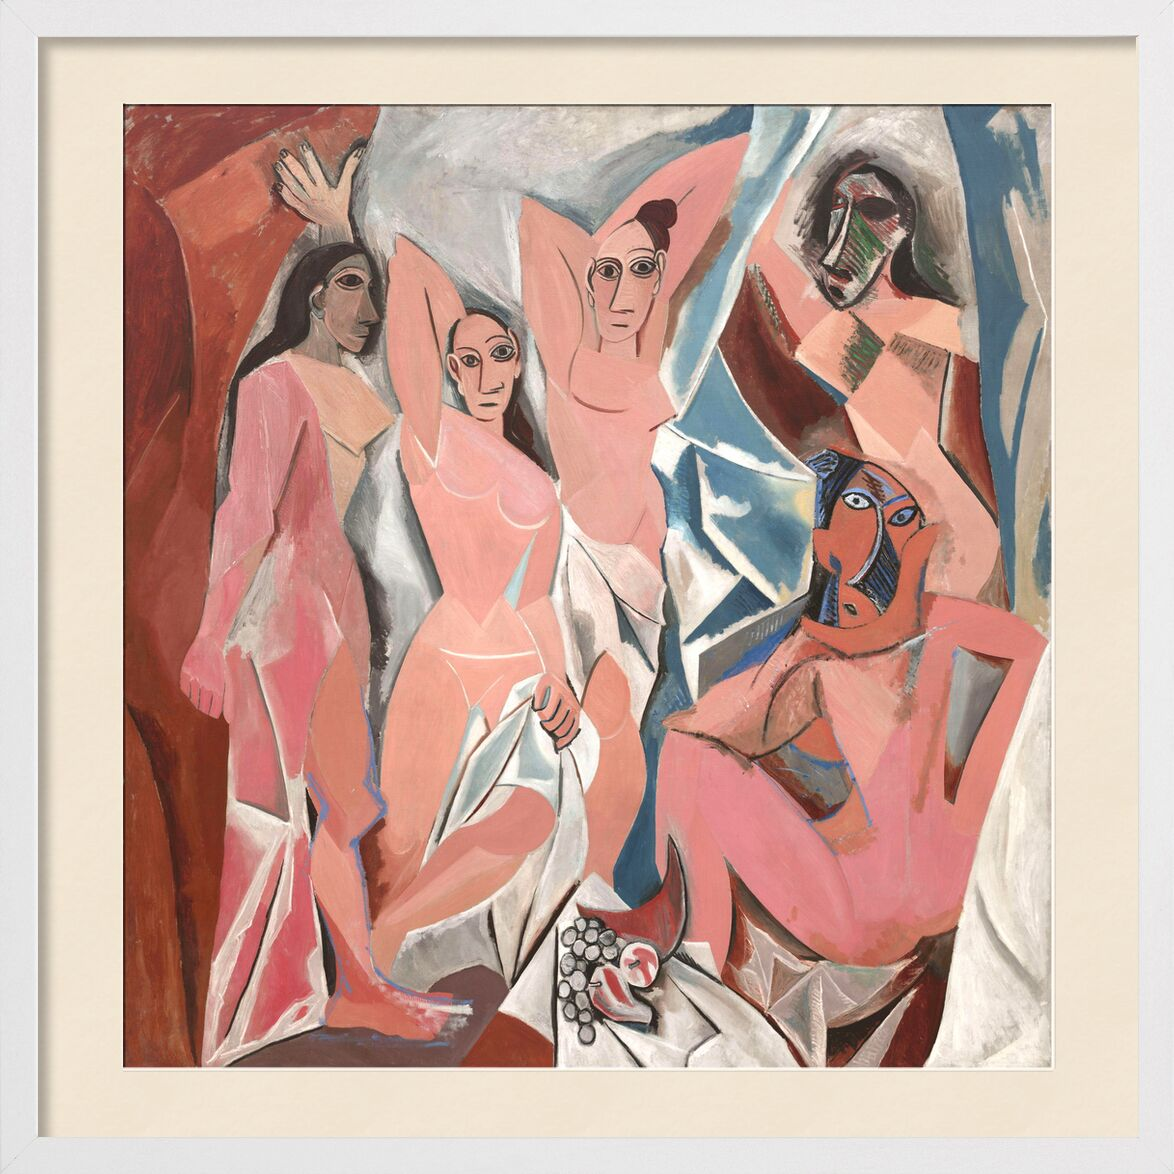 The Ladies of Avignon - PABLO PICASSO von AUX BEAUX-ARTS, Prodi Art, Tabelle, Frauen, Avignon, PABLO PICASSO, abstrakt, Malerei, Zeichnung, Frankreich